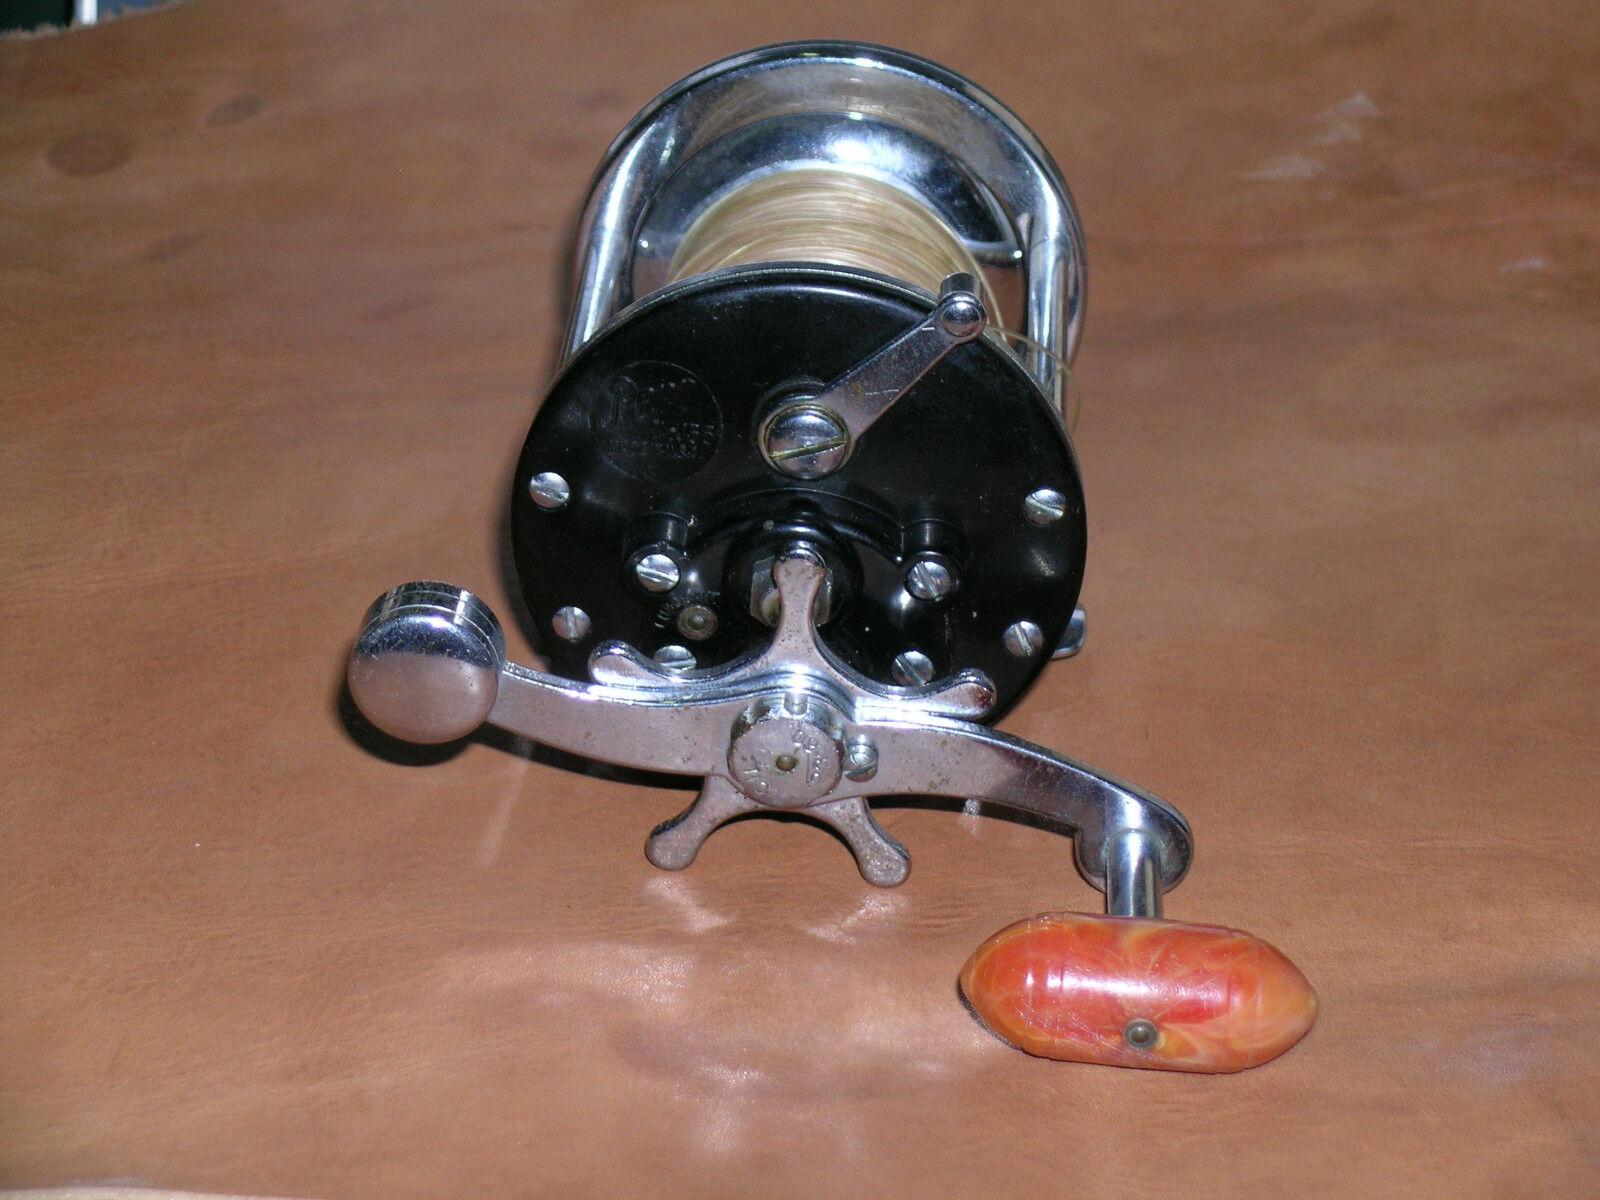 PENN mod.155  mulinello pesca reel mare,sea,bay,deep,troll, surf casting fishing reel pesca bd9a15